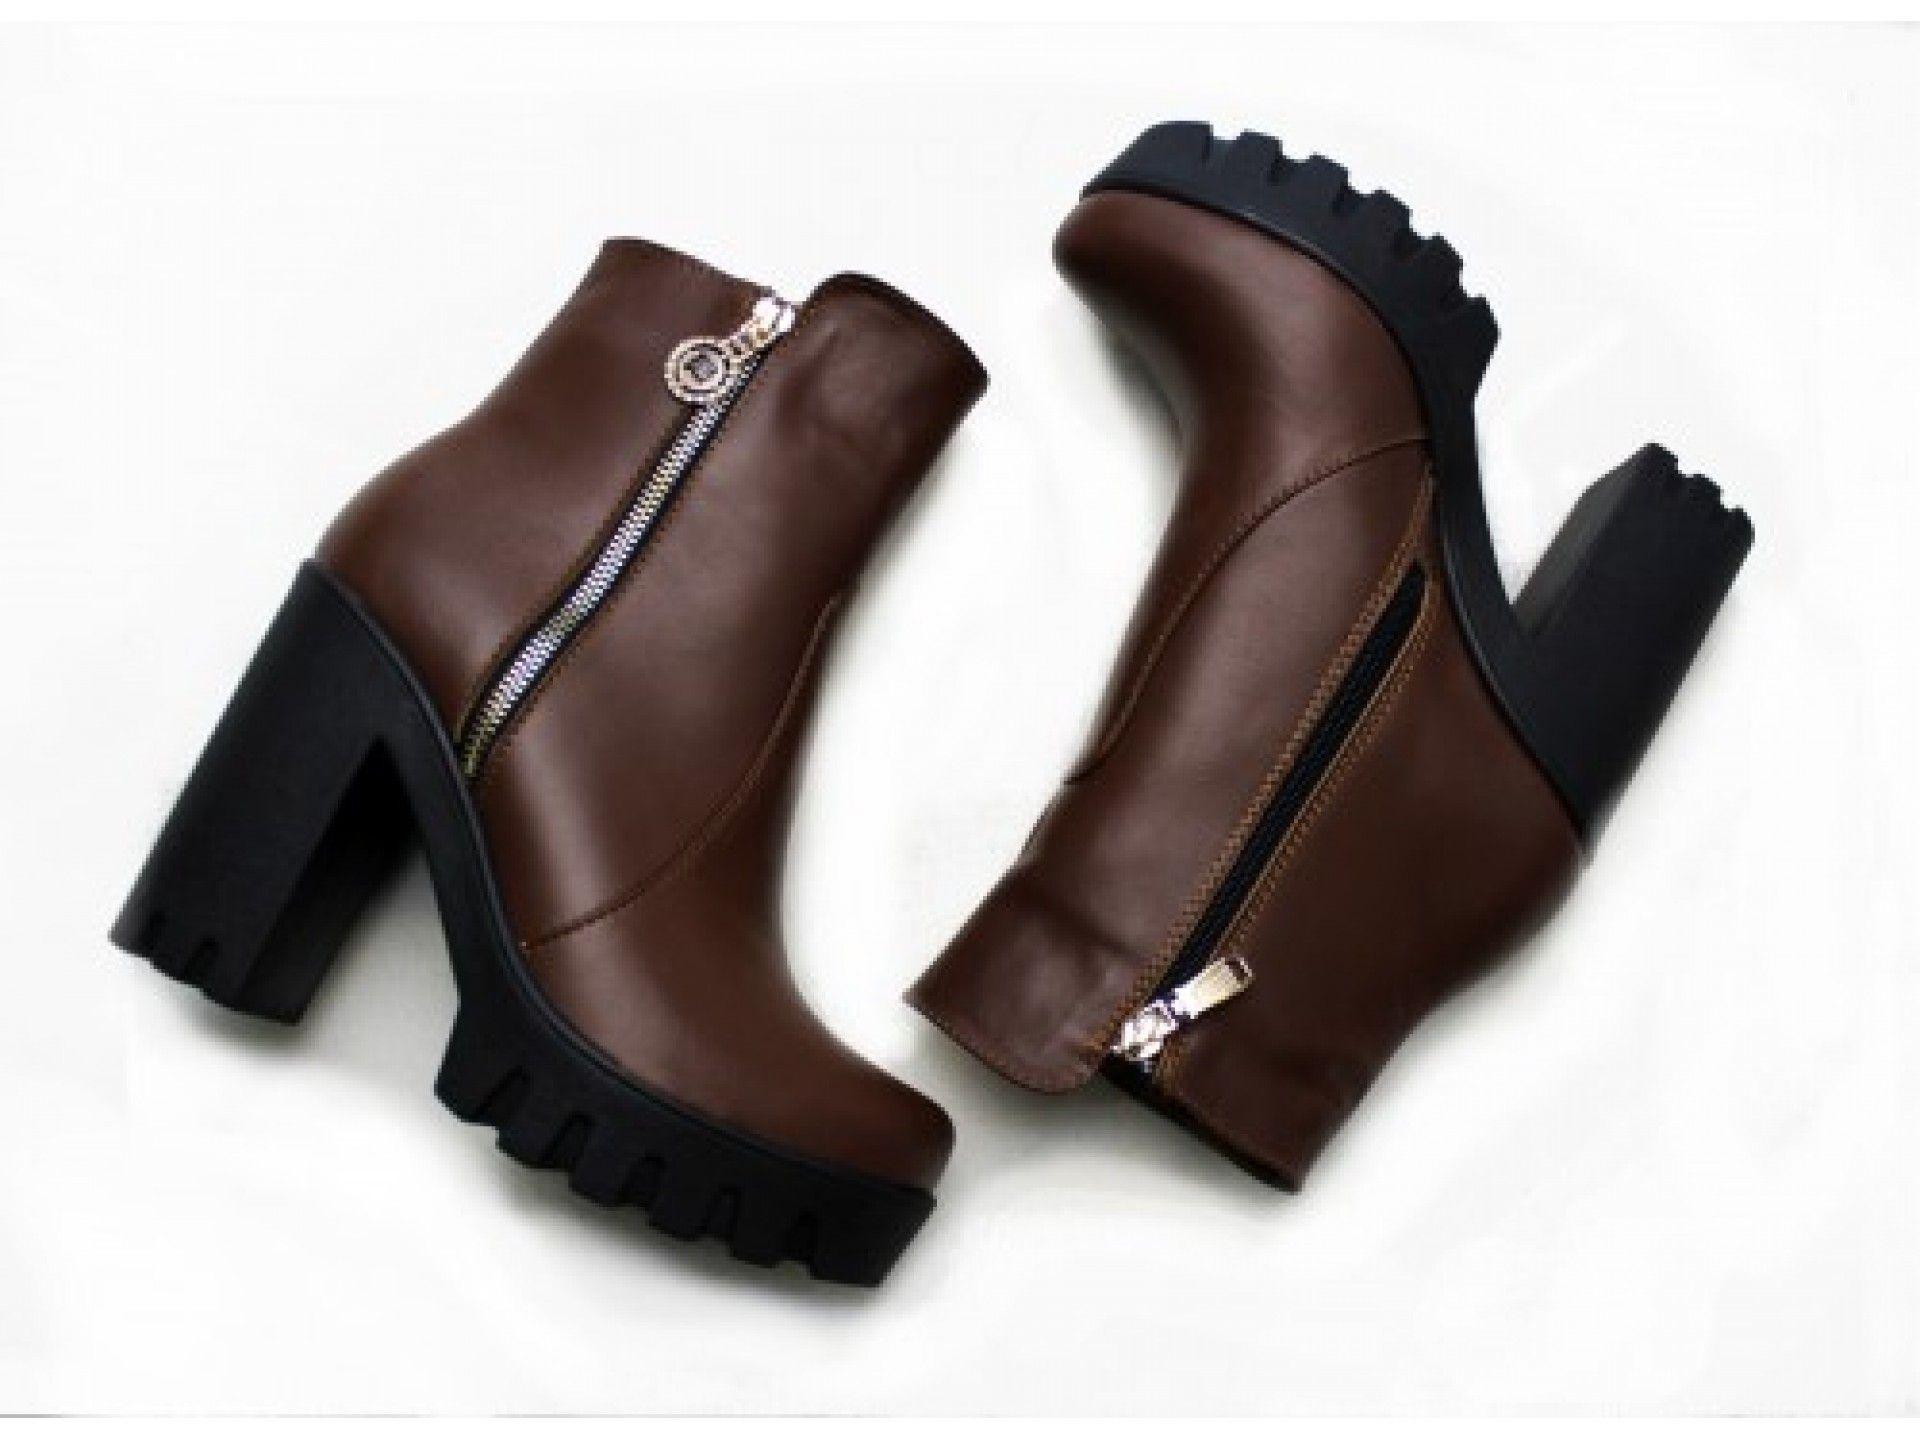 Коллекция женской обуви 2013 от Mara Mine